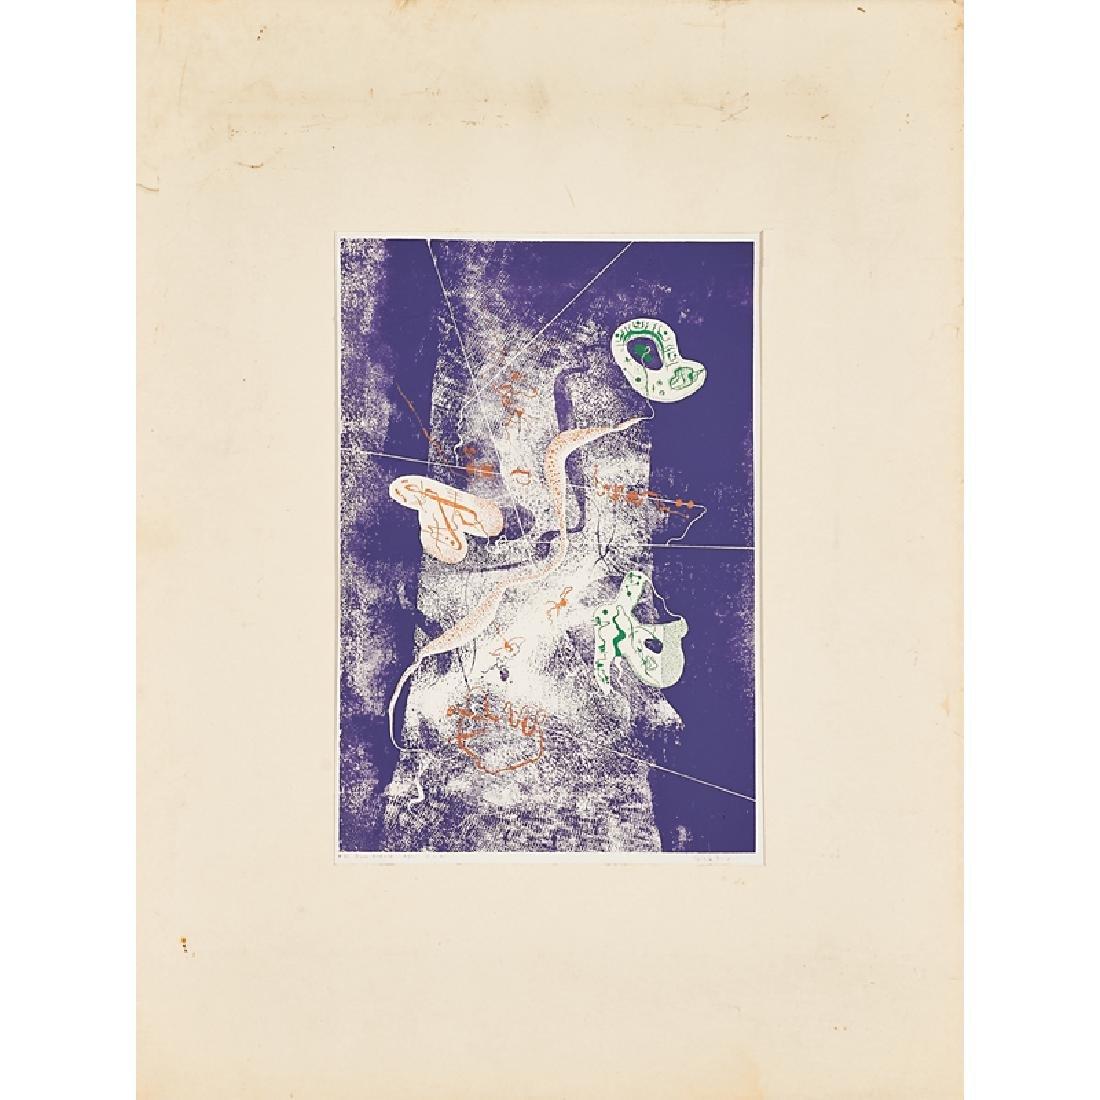 ROBERT VALE FARO (American, 1902-1988) - 7